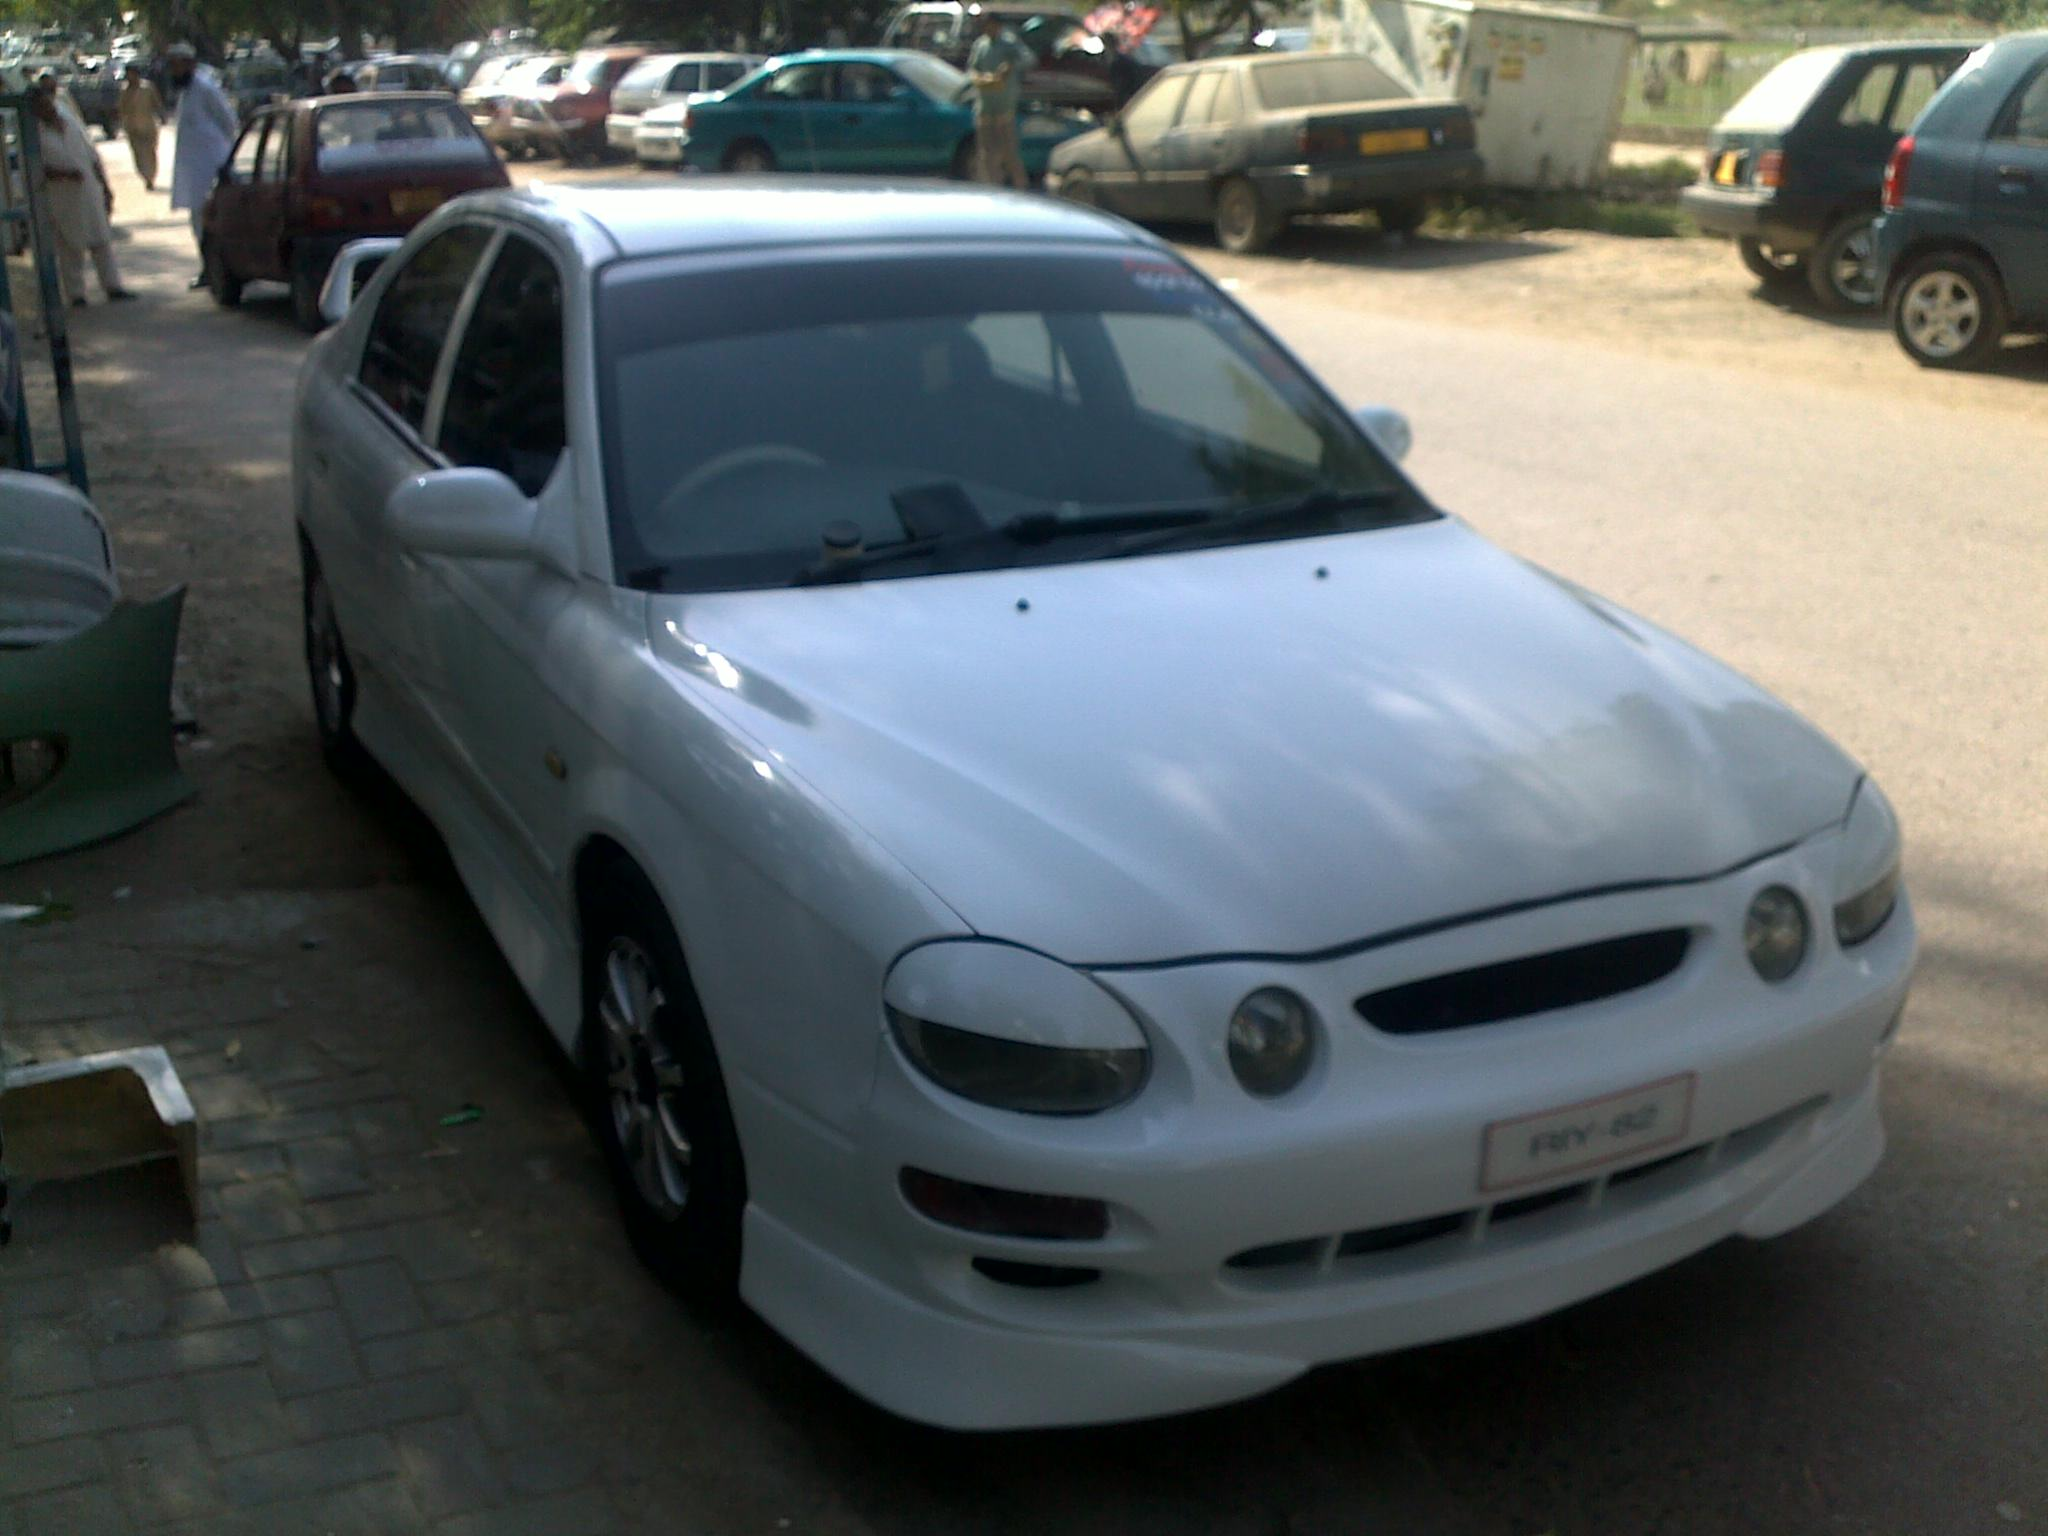 0 Down Car Insurance >> KIA Spectra 2002 of zain8 - Member Ride 16948 | PakWheels